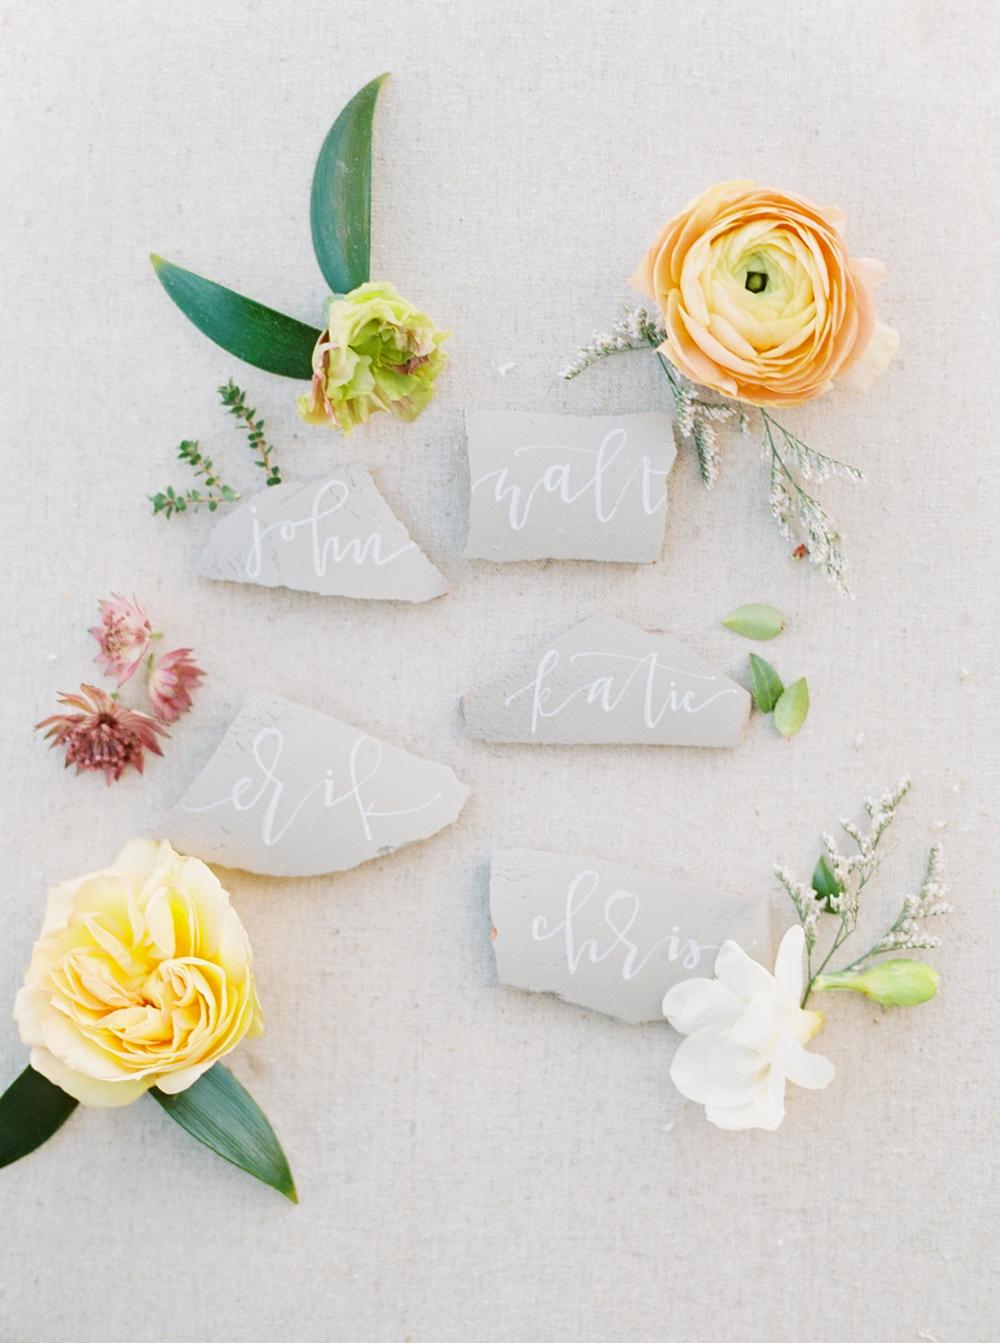 Utah Sand Dunes Wedding | Callie Manion Photography | Utah Photographer | Joy Wed | Fine Art Wedding Blog | Canadian Wedding Blog | Desert Wedding | Stacey Foley Design | Canmore Wedding Planner